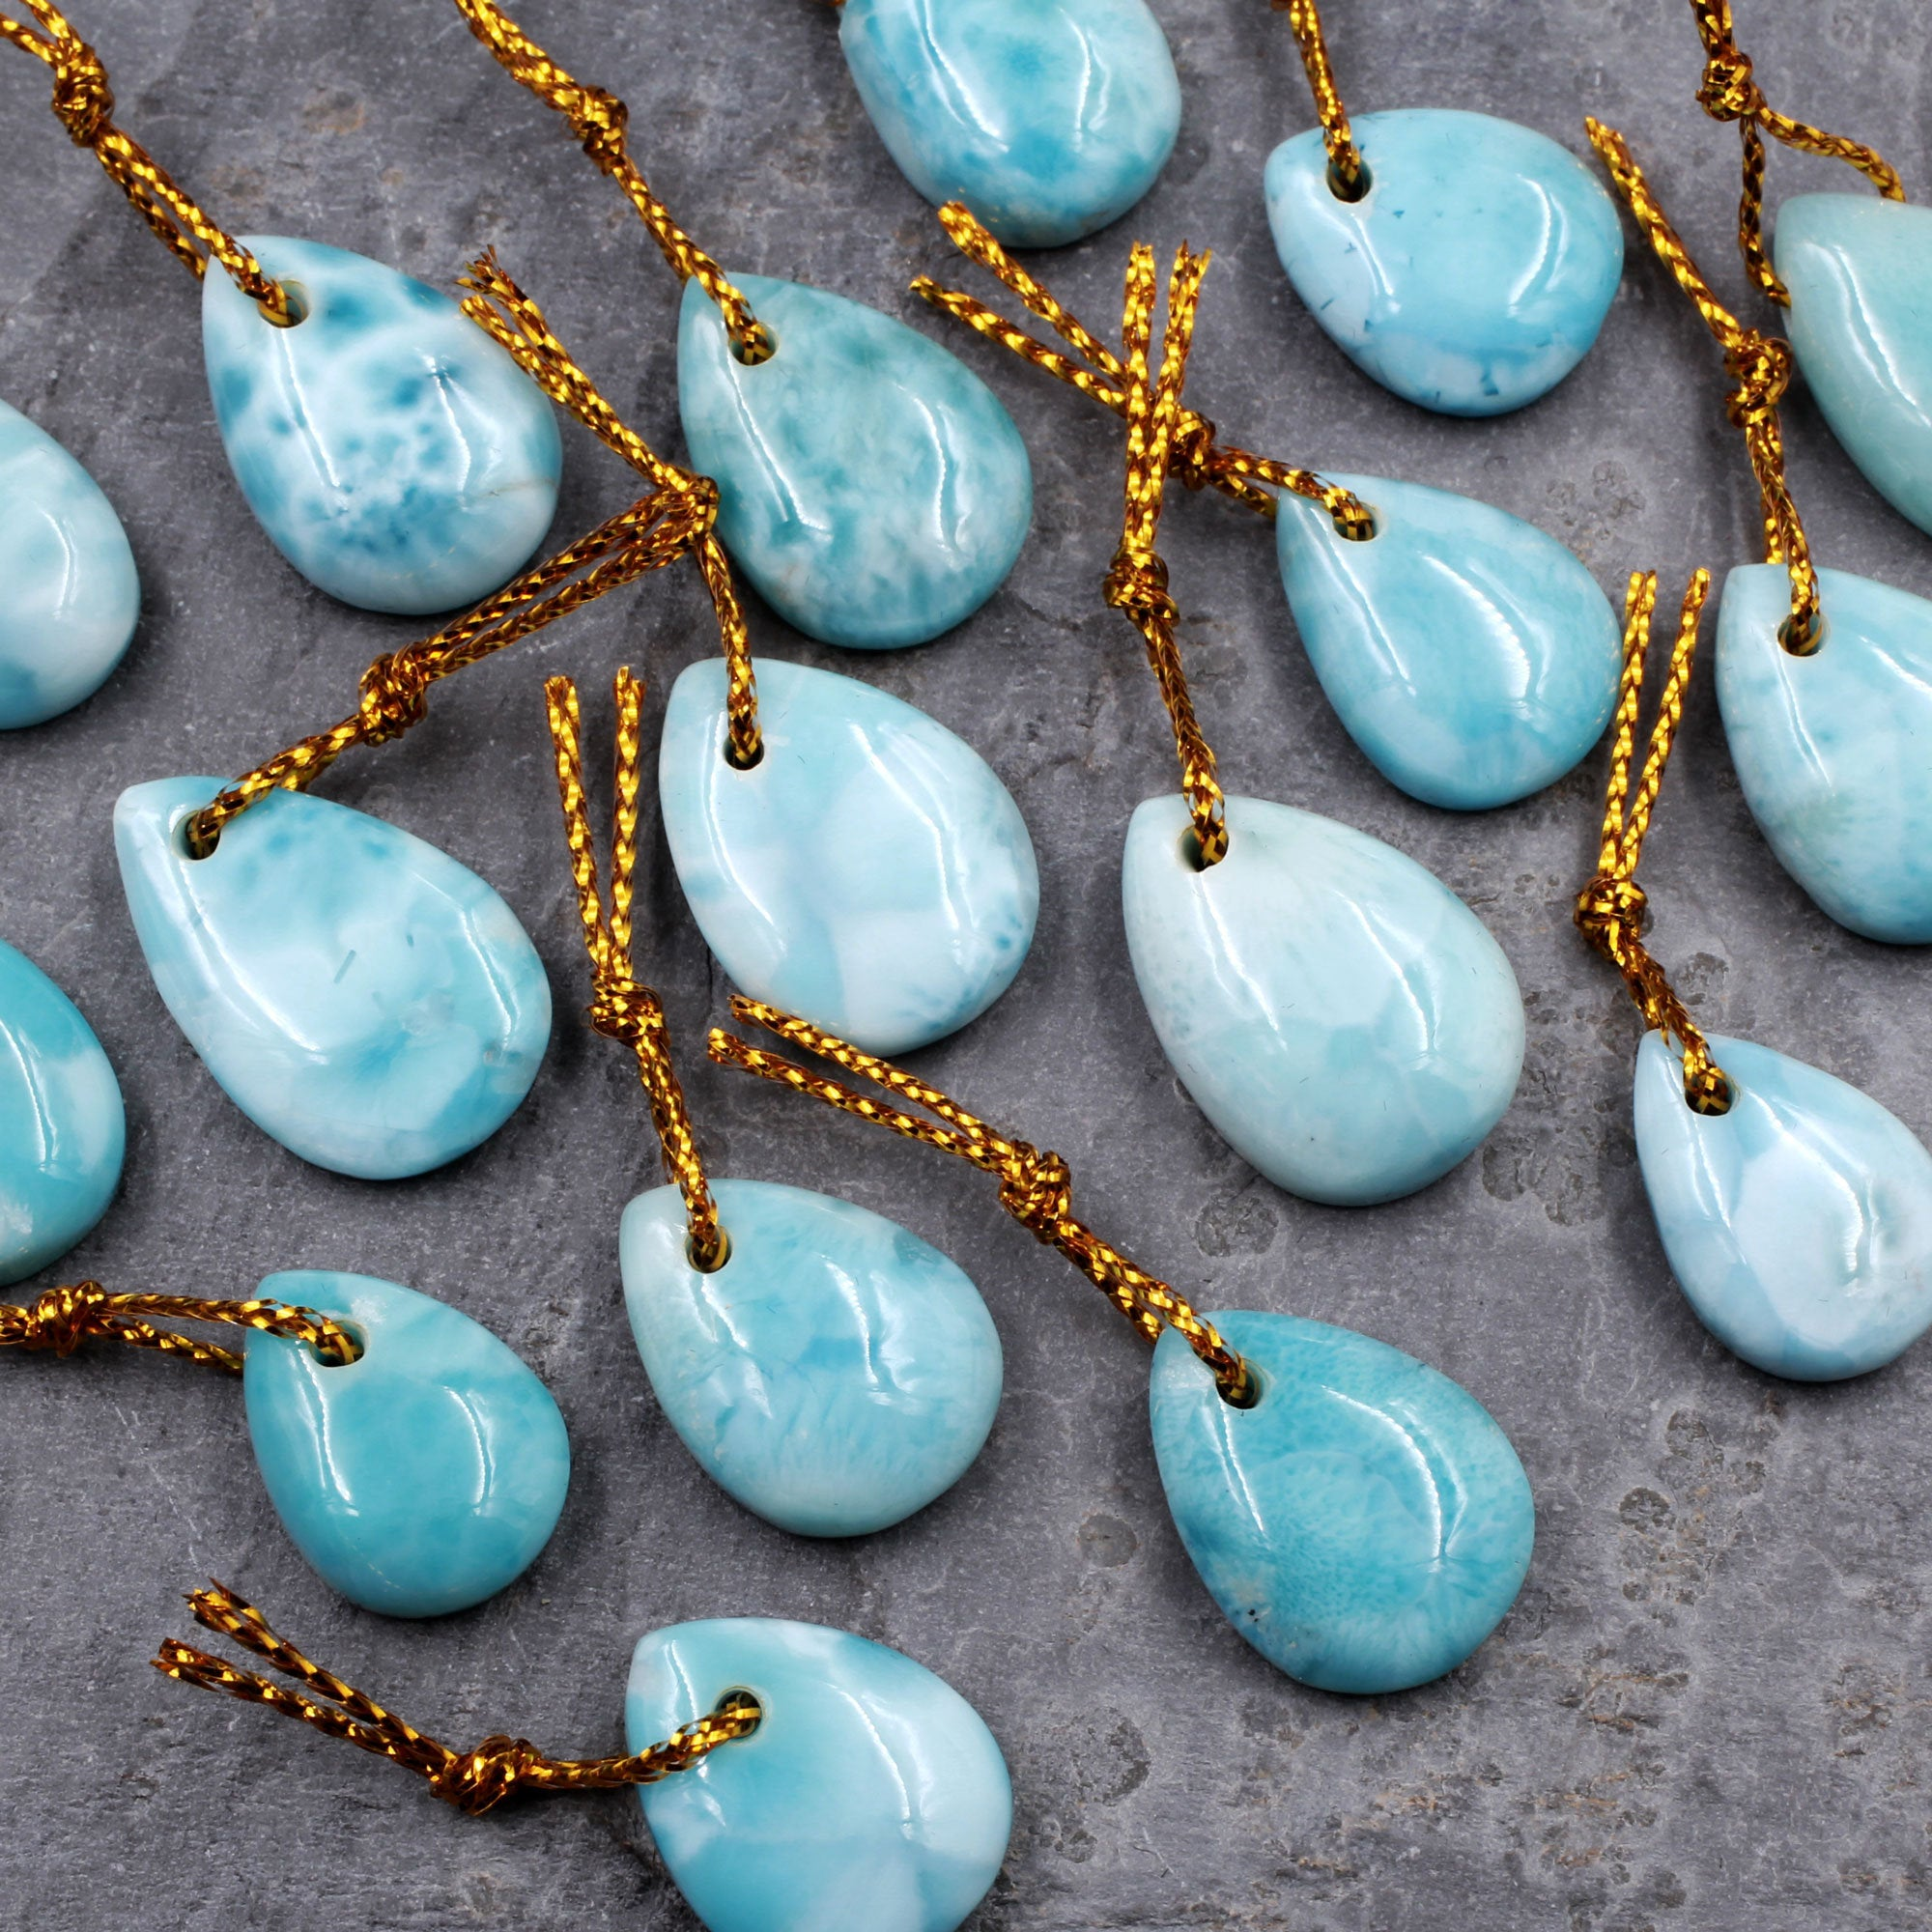 Natural Blue Larimar Teardrop Pendant Drilled Gemstone Focal Bead